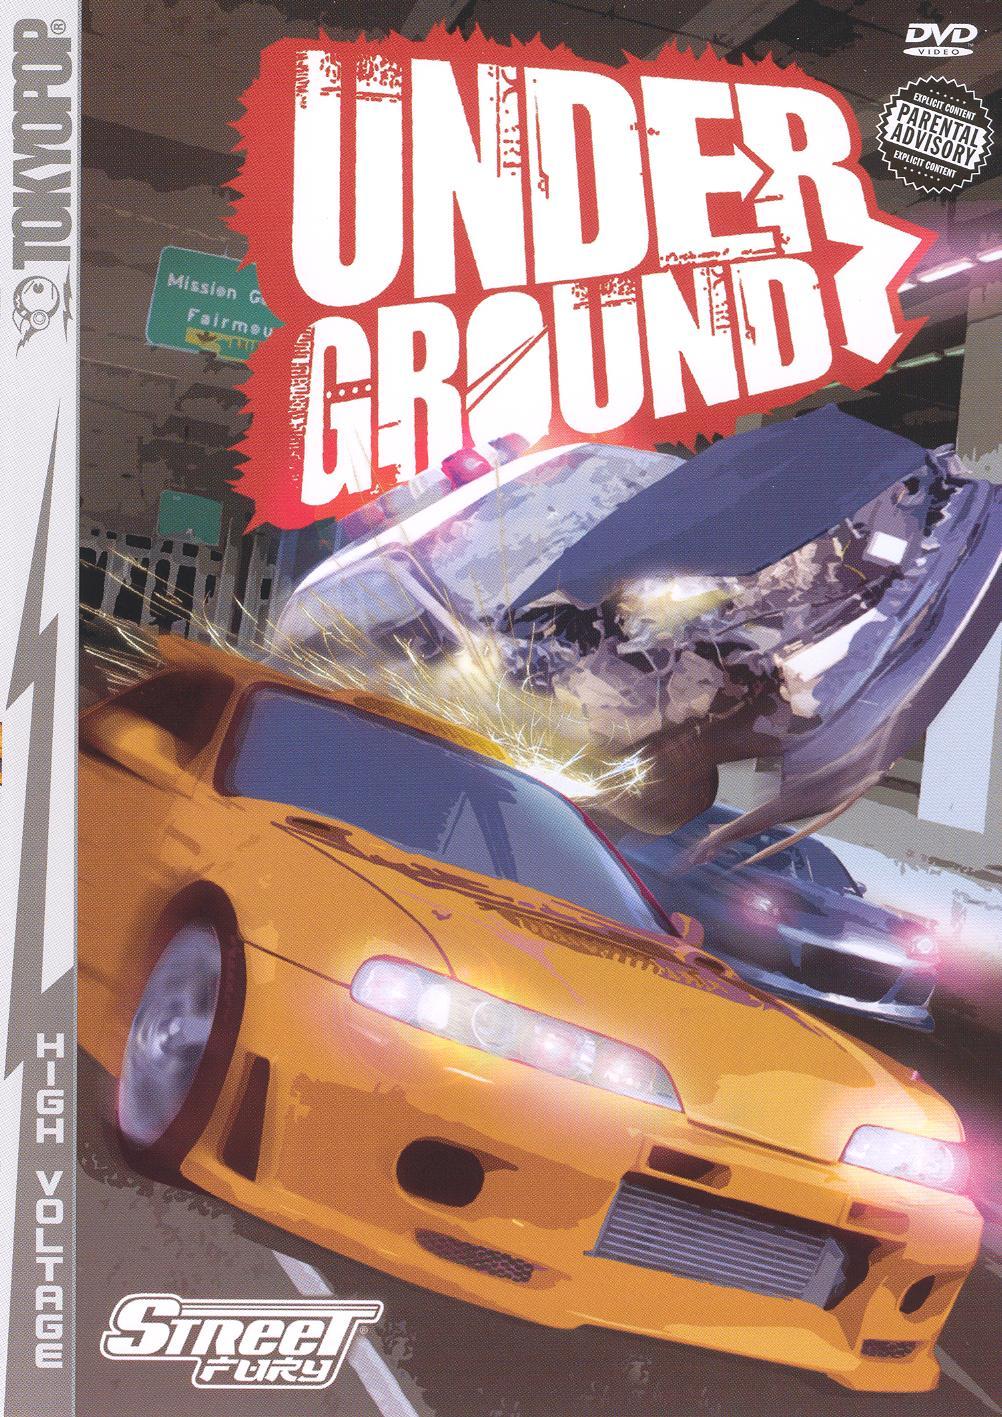 Street Fury: Underground